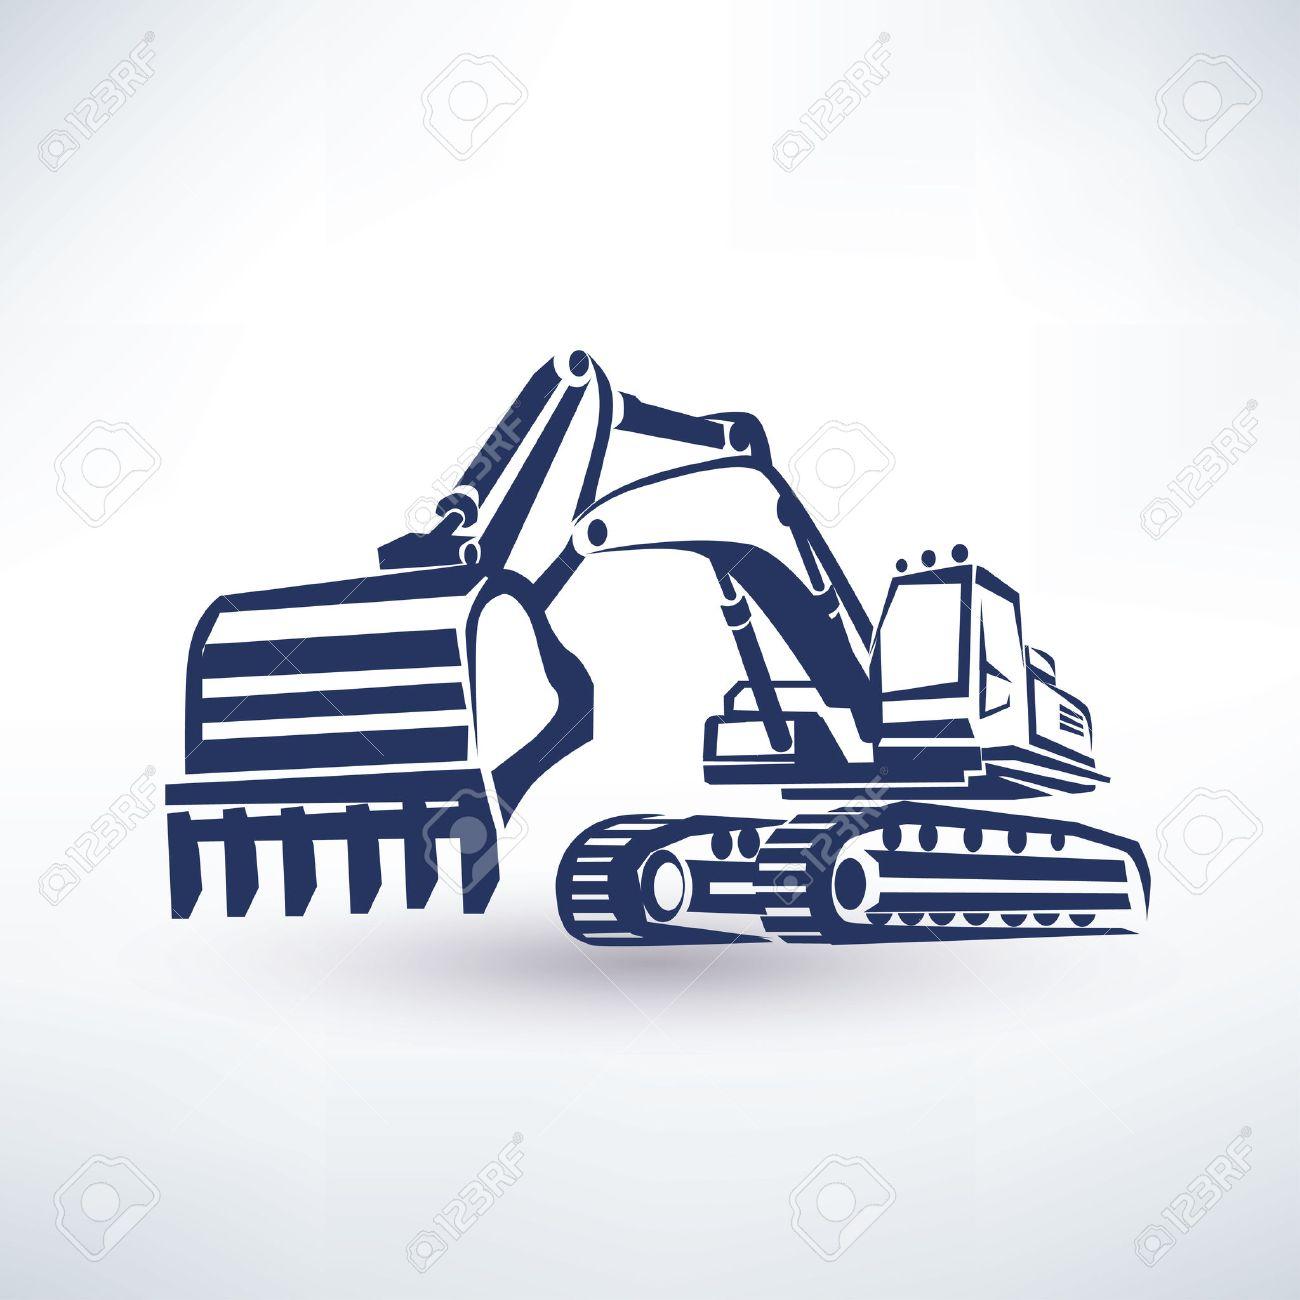 excavator symbol, stylized vector silhouette - 45349646